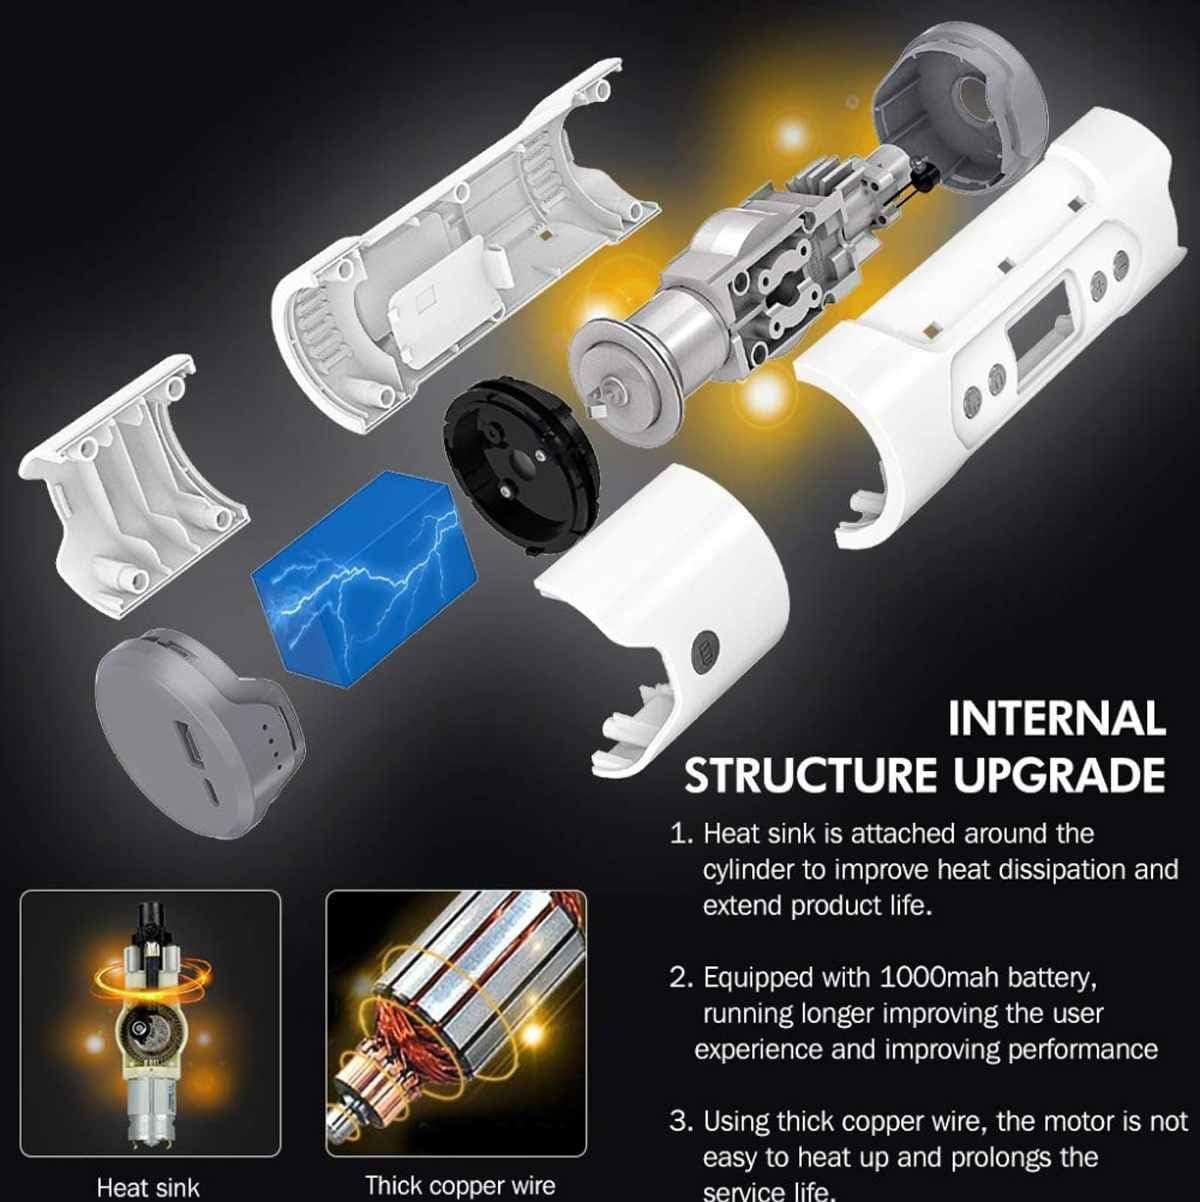 HS-XP Multifunctional Wireless Intelligent Car Air Pump Portable Air Compressor 12V Tire Inflator,Black White